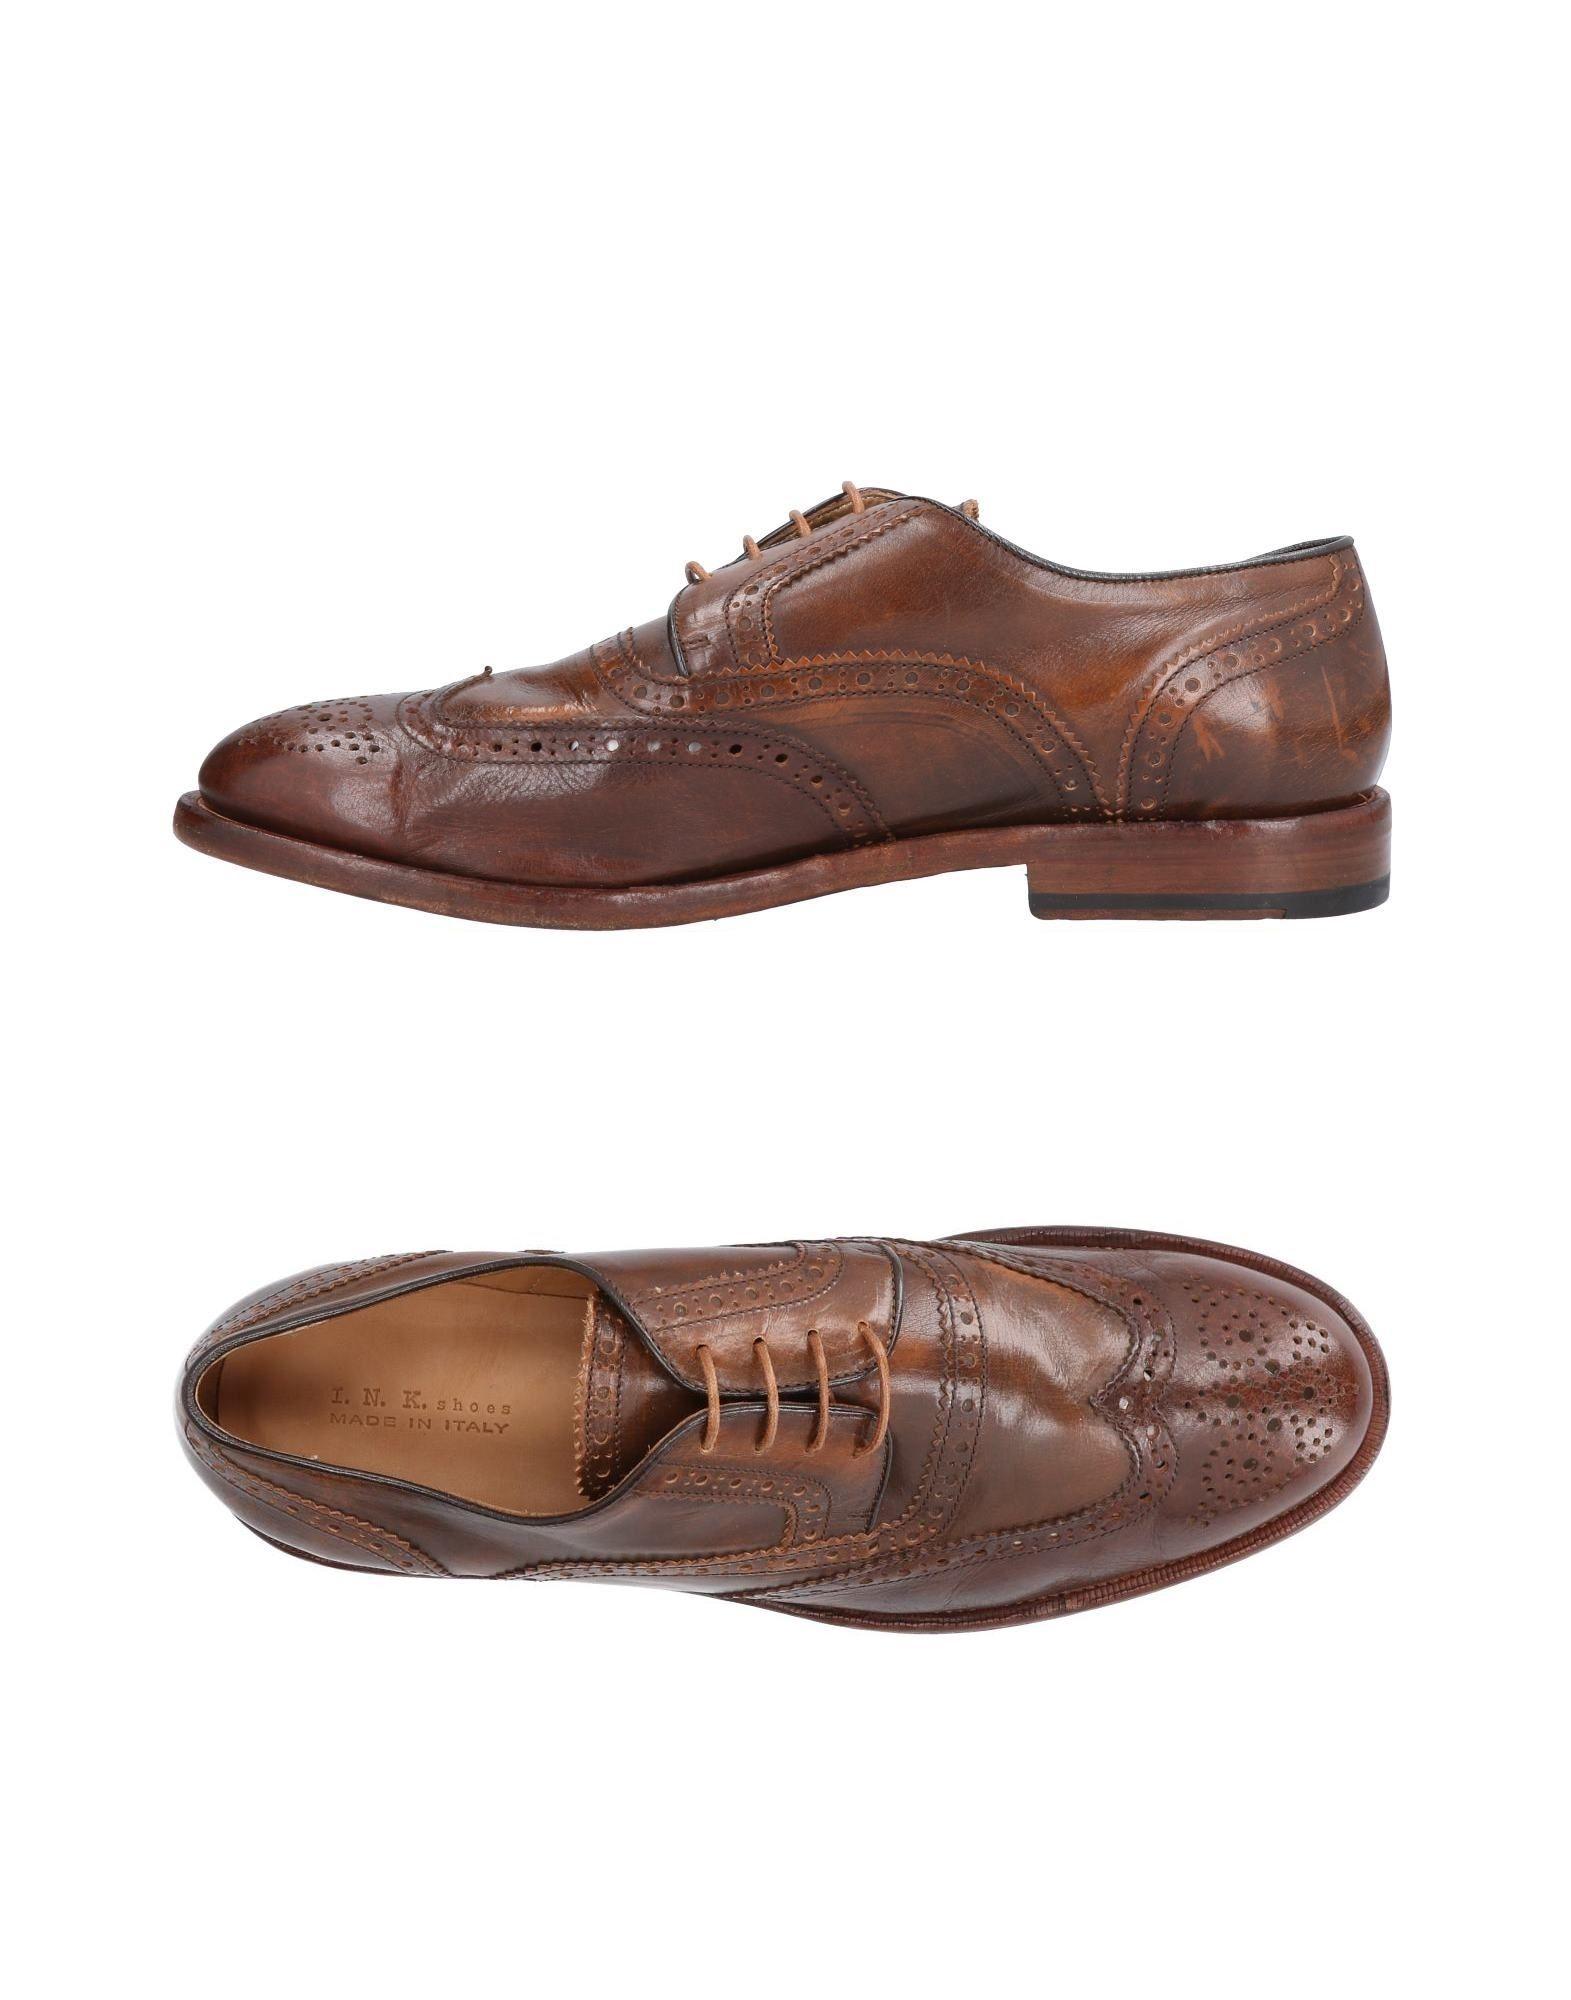 Stringate Uomo I.N.K. Shoes Uomo Stringate - 11488080PK 364801